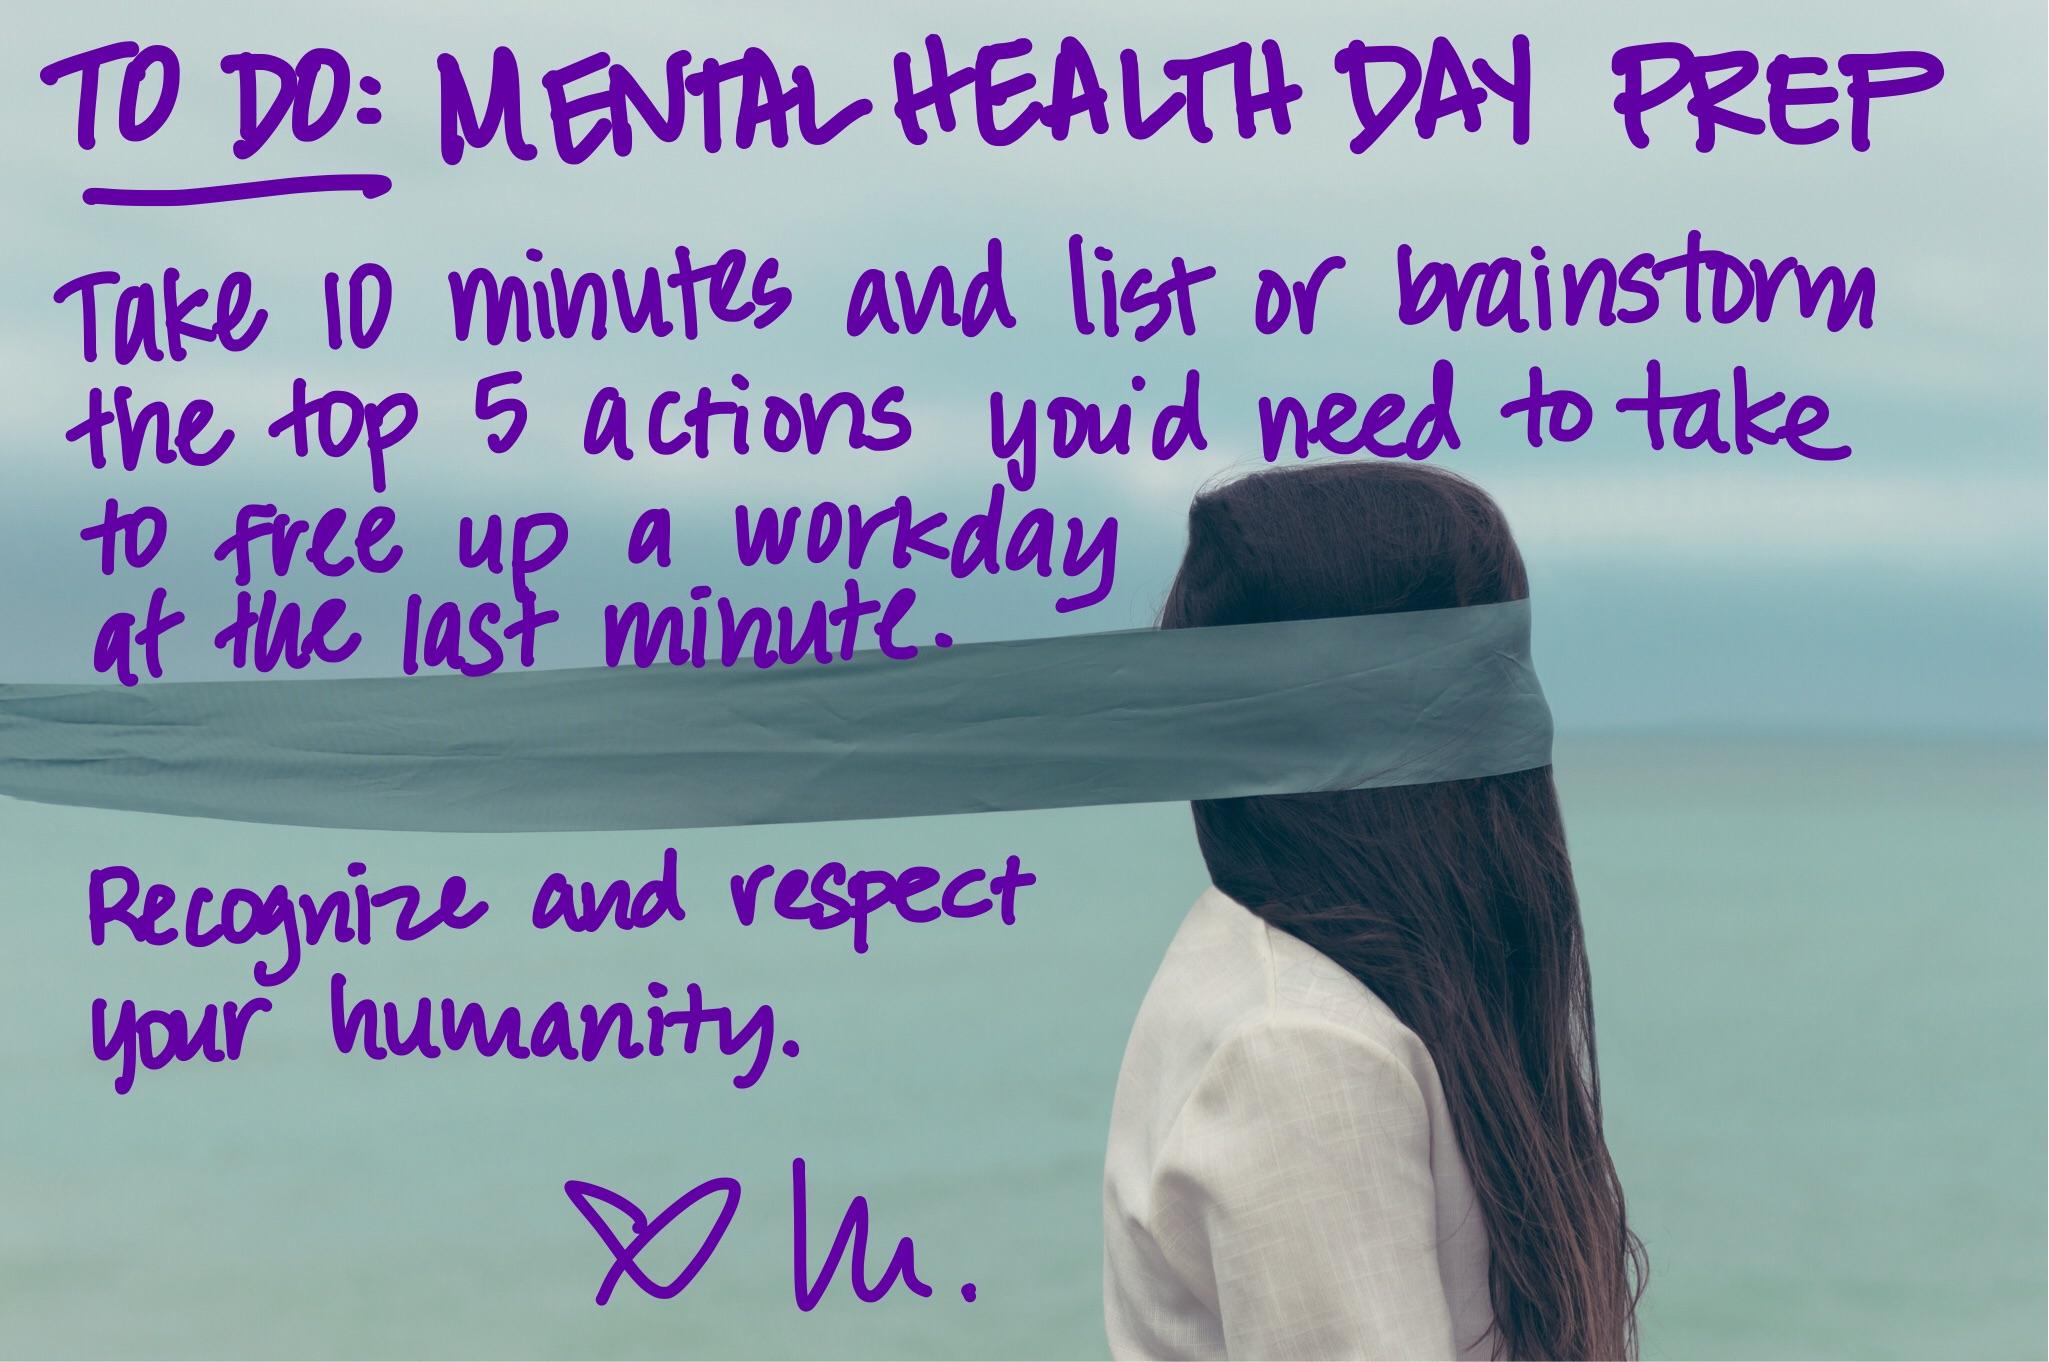 mental health day prep.png